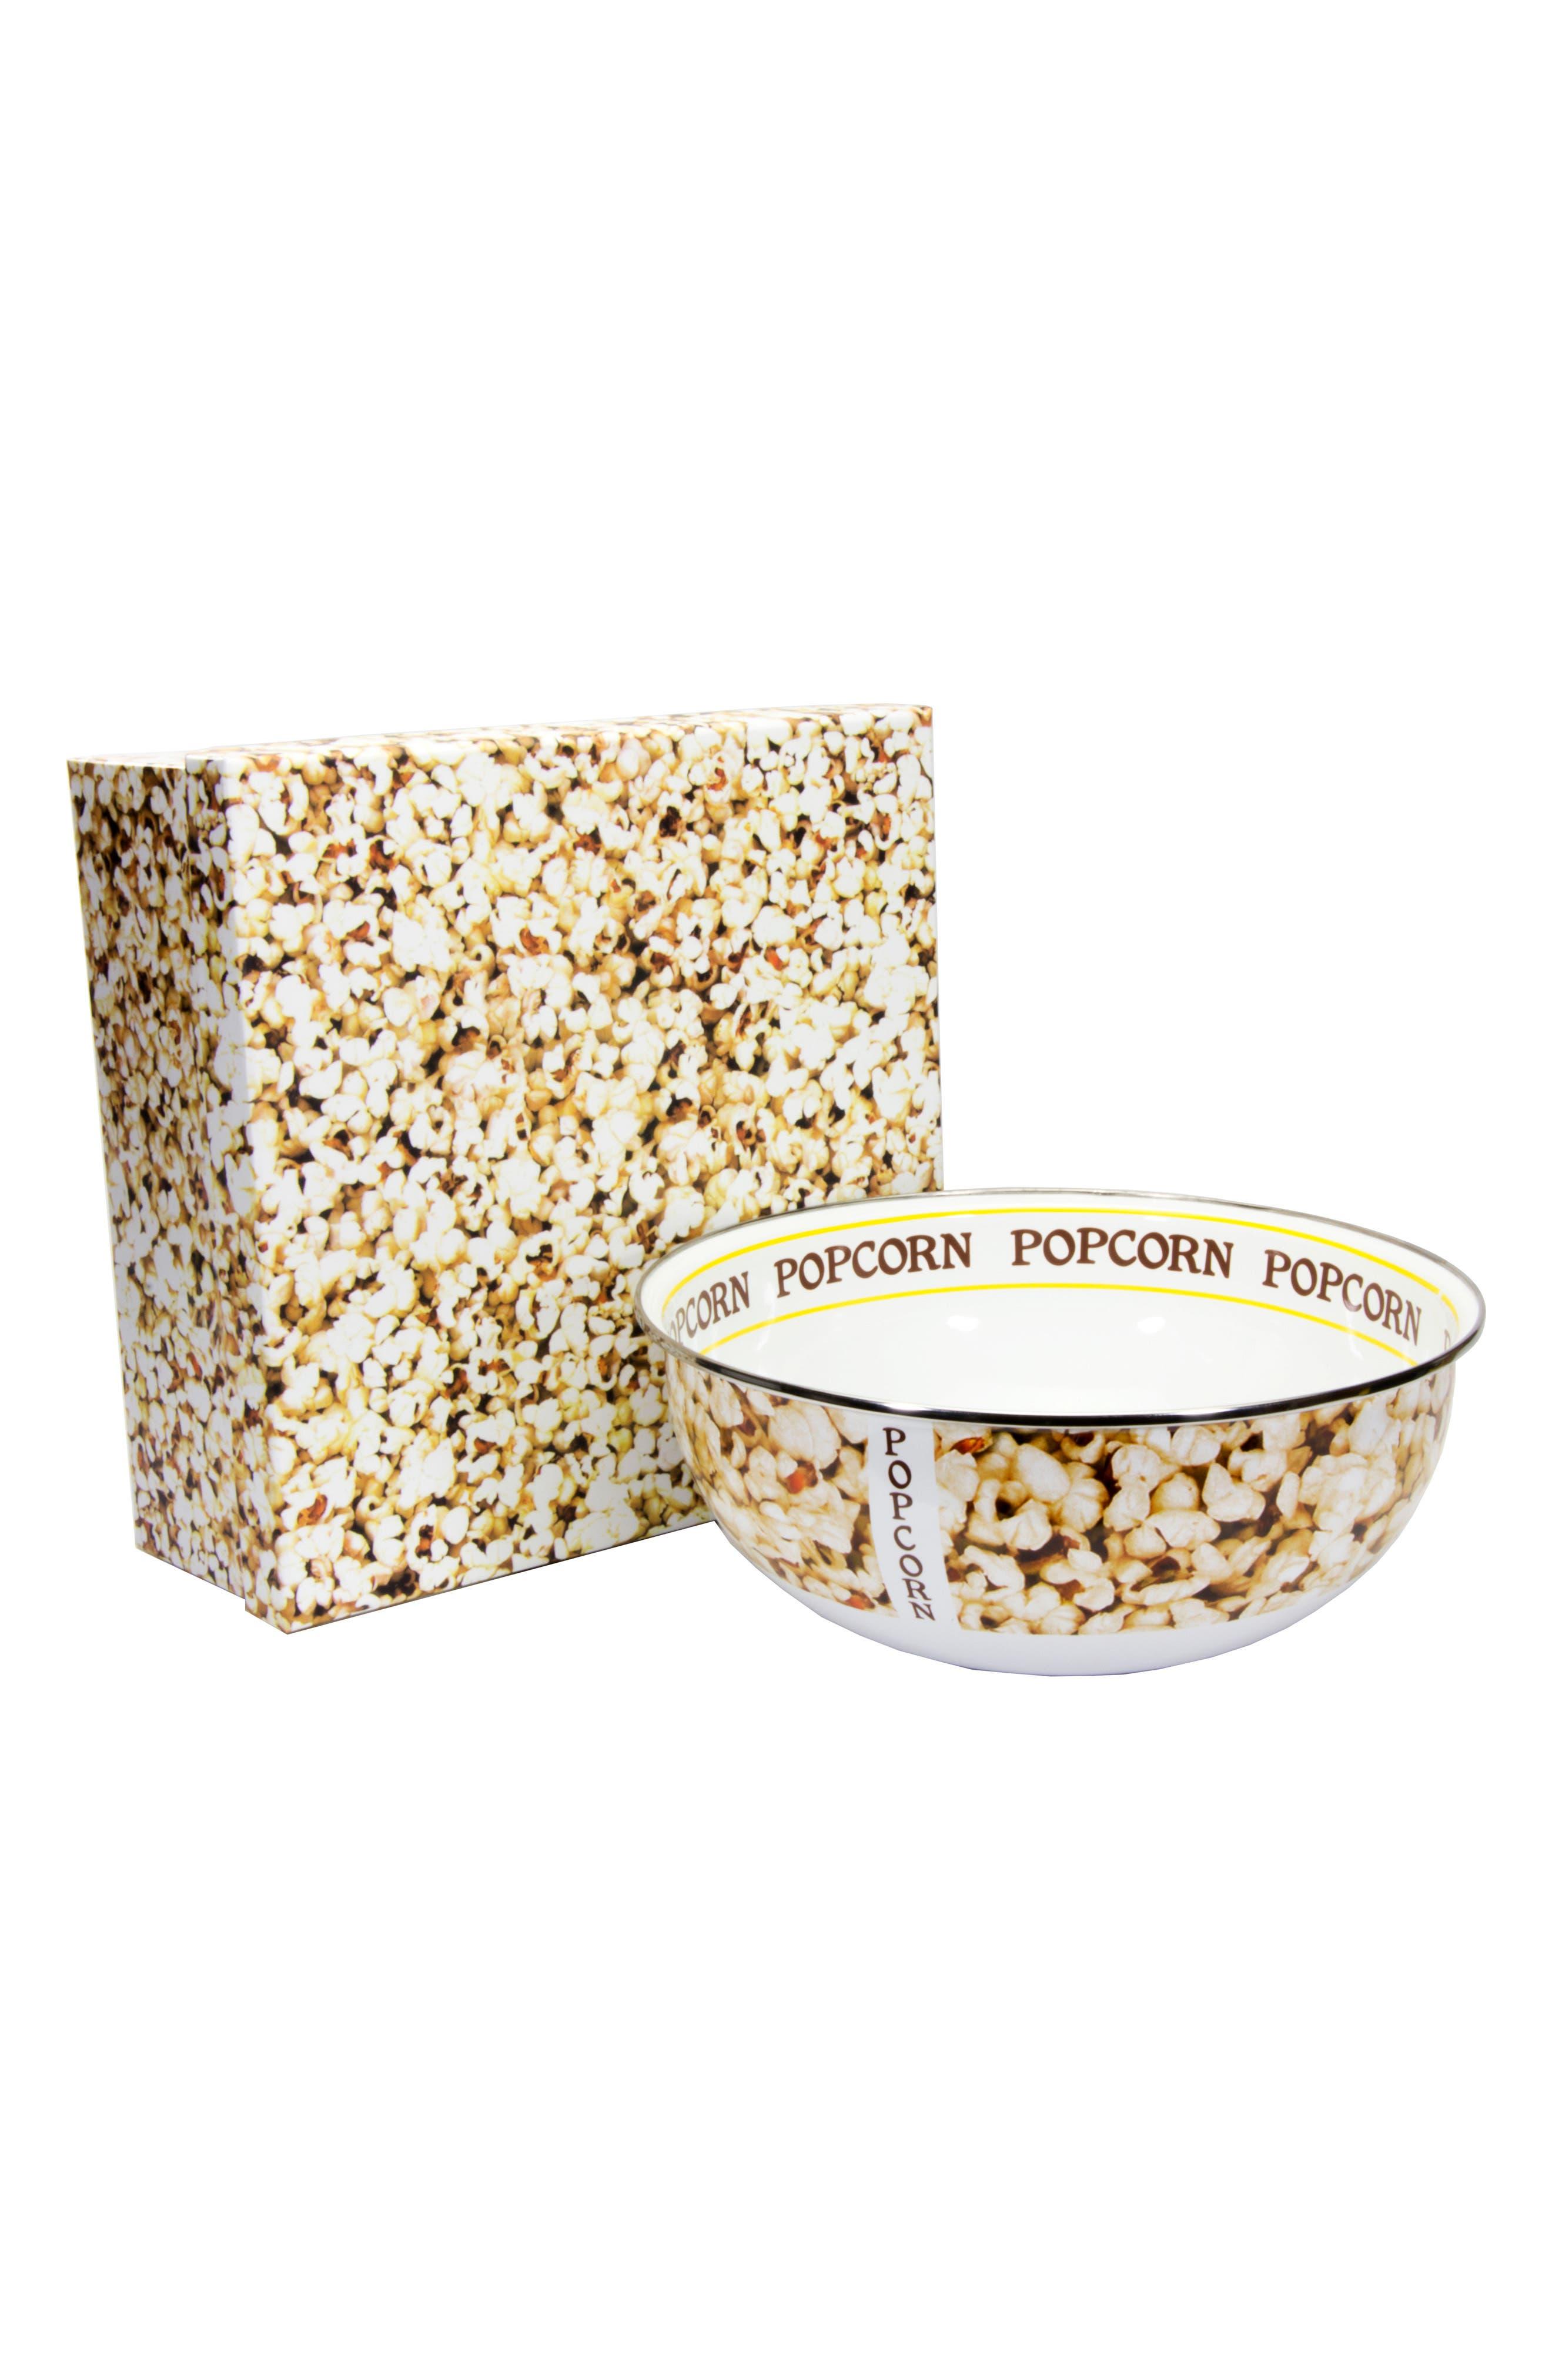 Popcorn Bowl,                             Main thumbnail 1, color,                             Popcorn